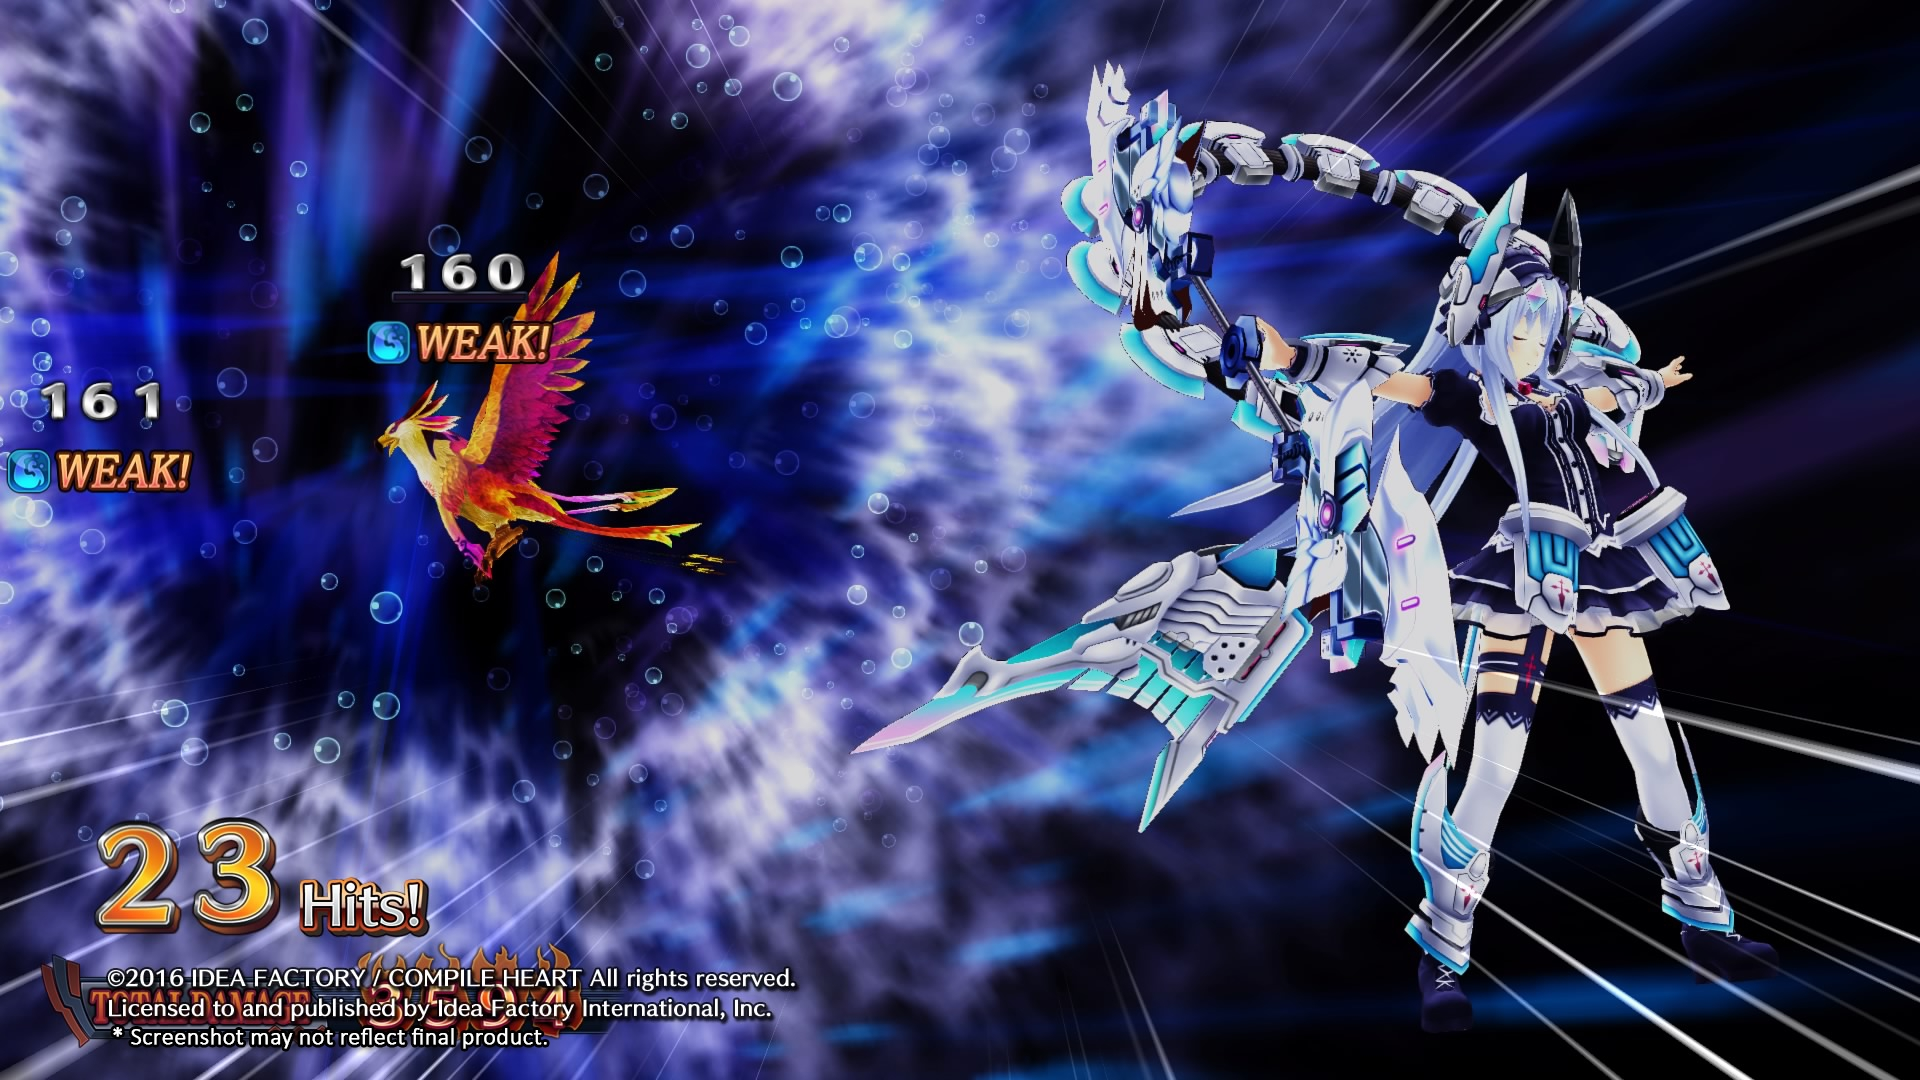 Fairy Fencer F Advent Dark Force Screenshot 6